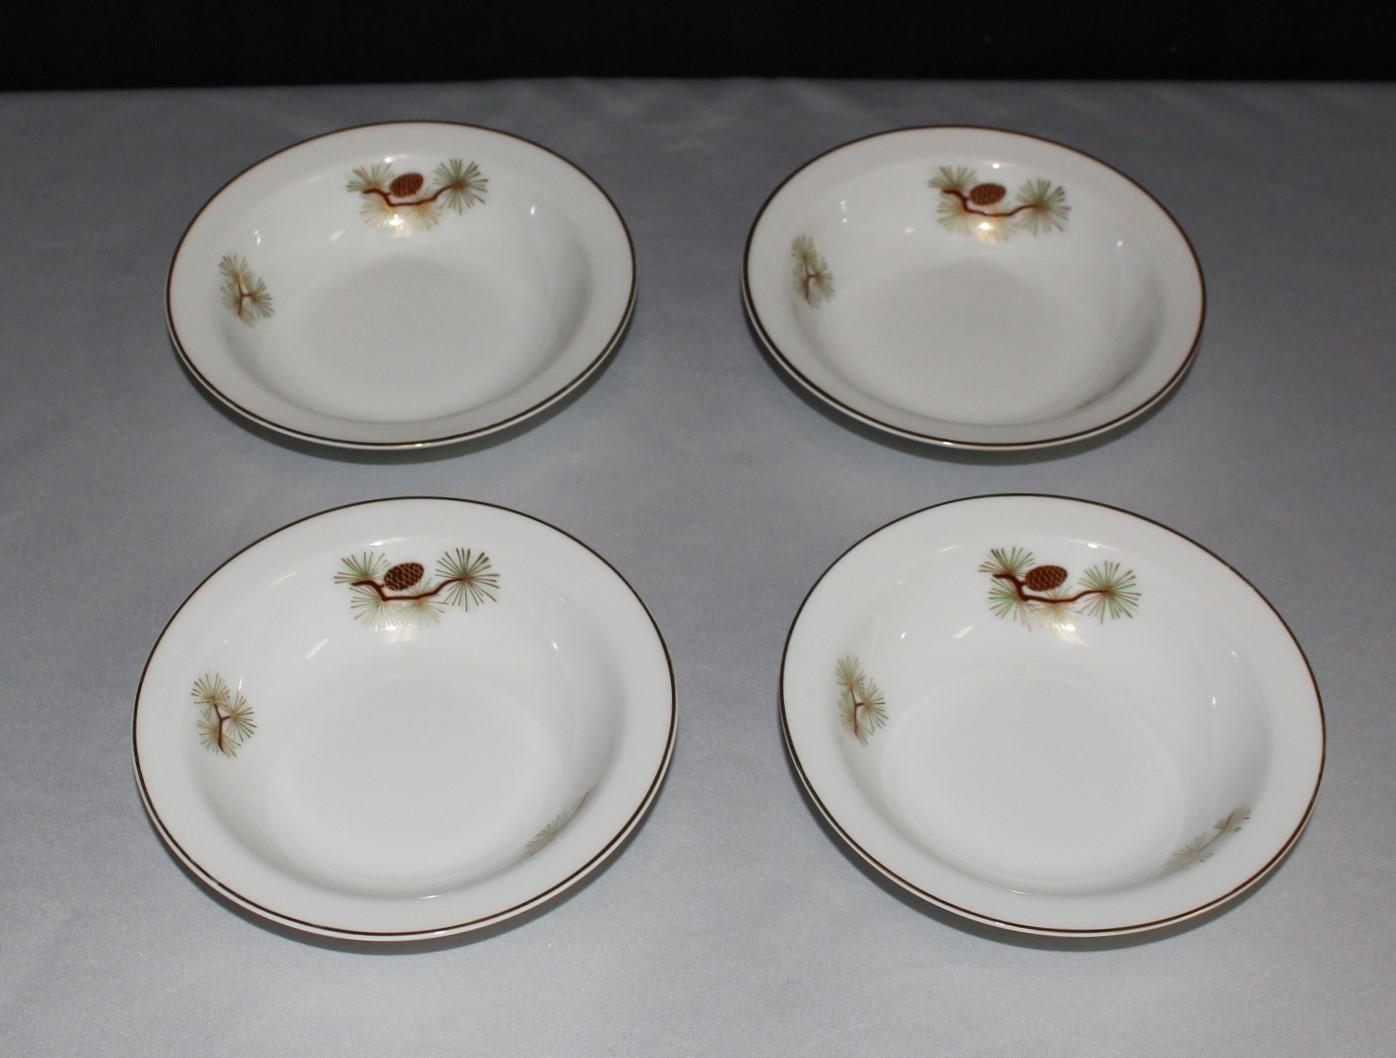 Set of (4) Fukagawa Arita Fruit / Dessert Rim Bowls, Pine Needles & Cones Japan